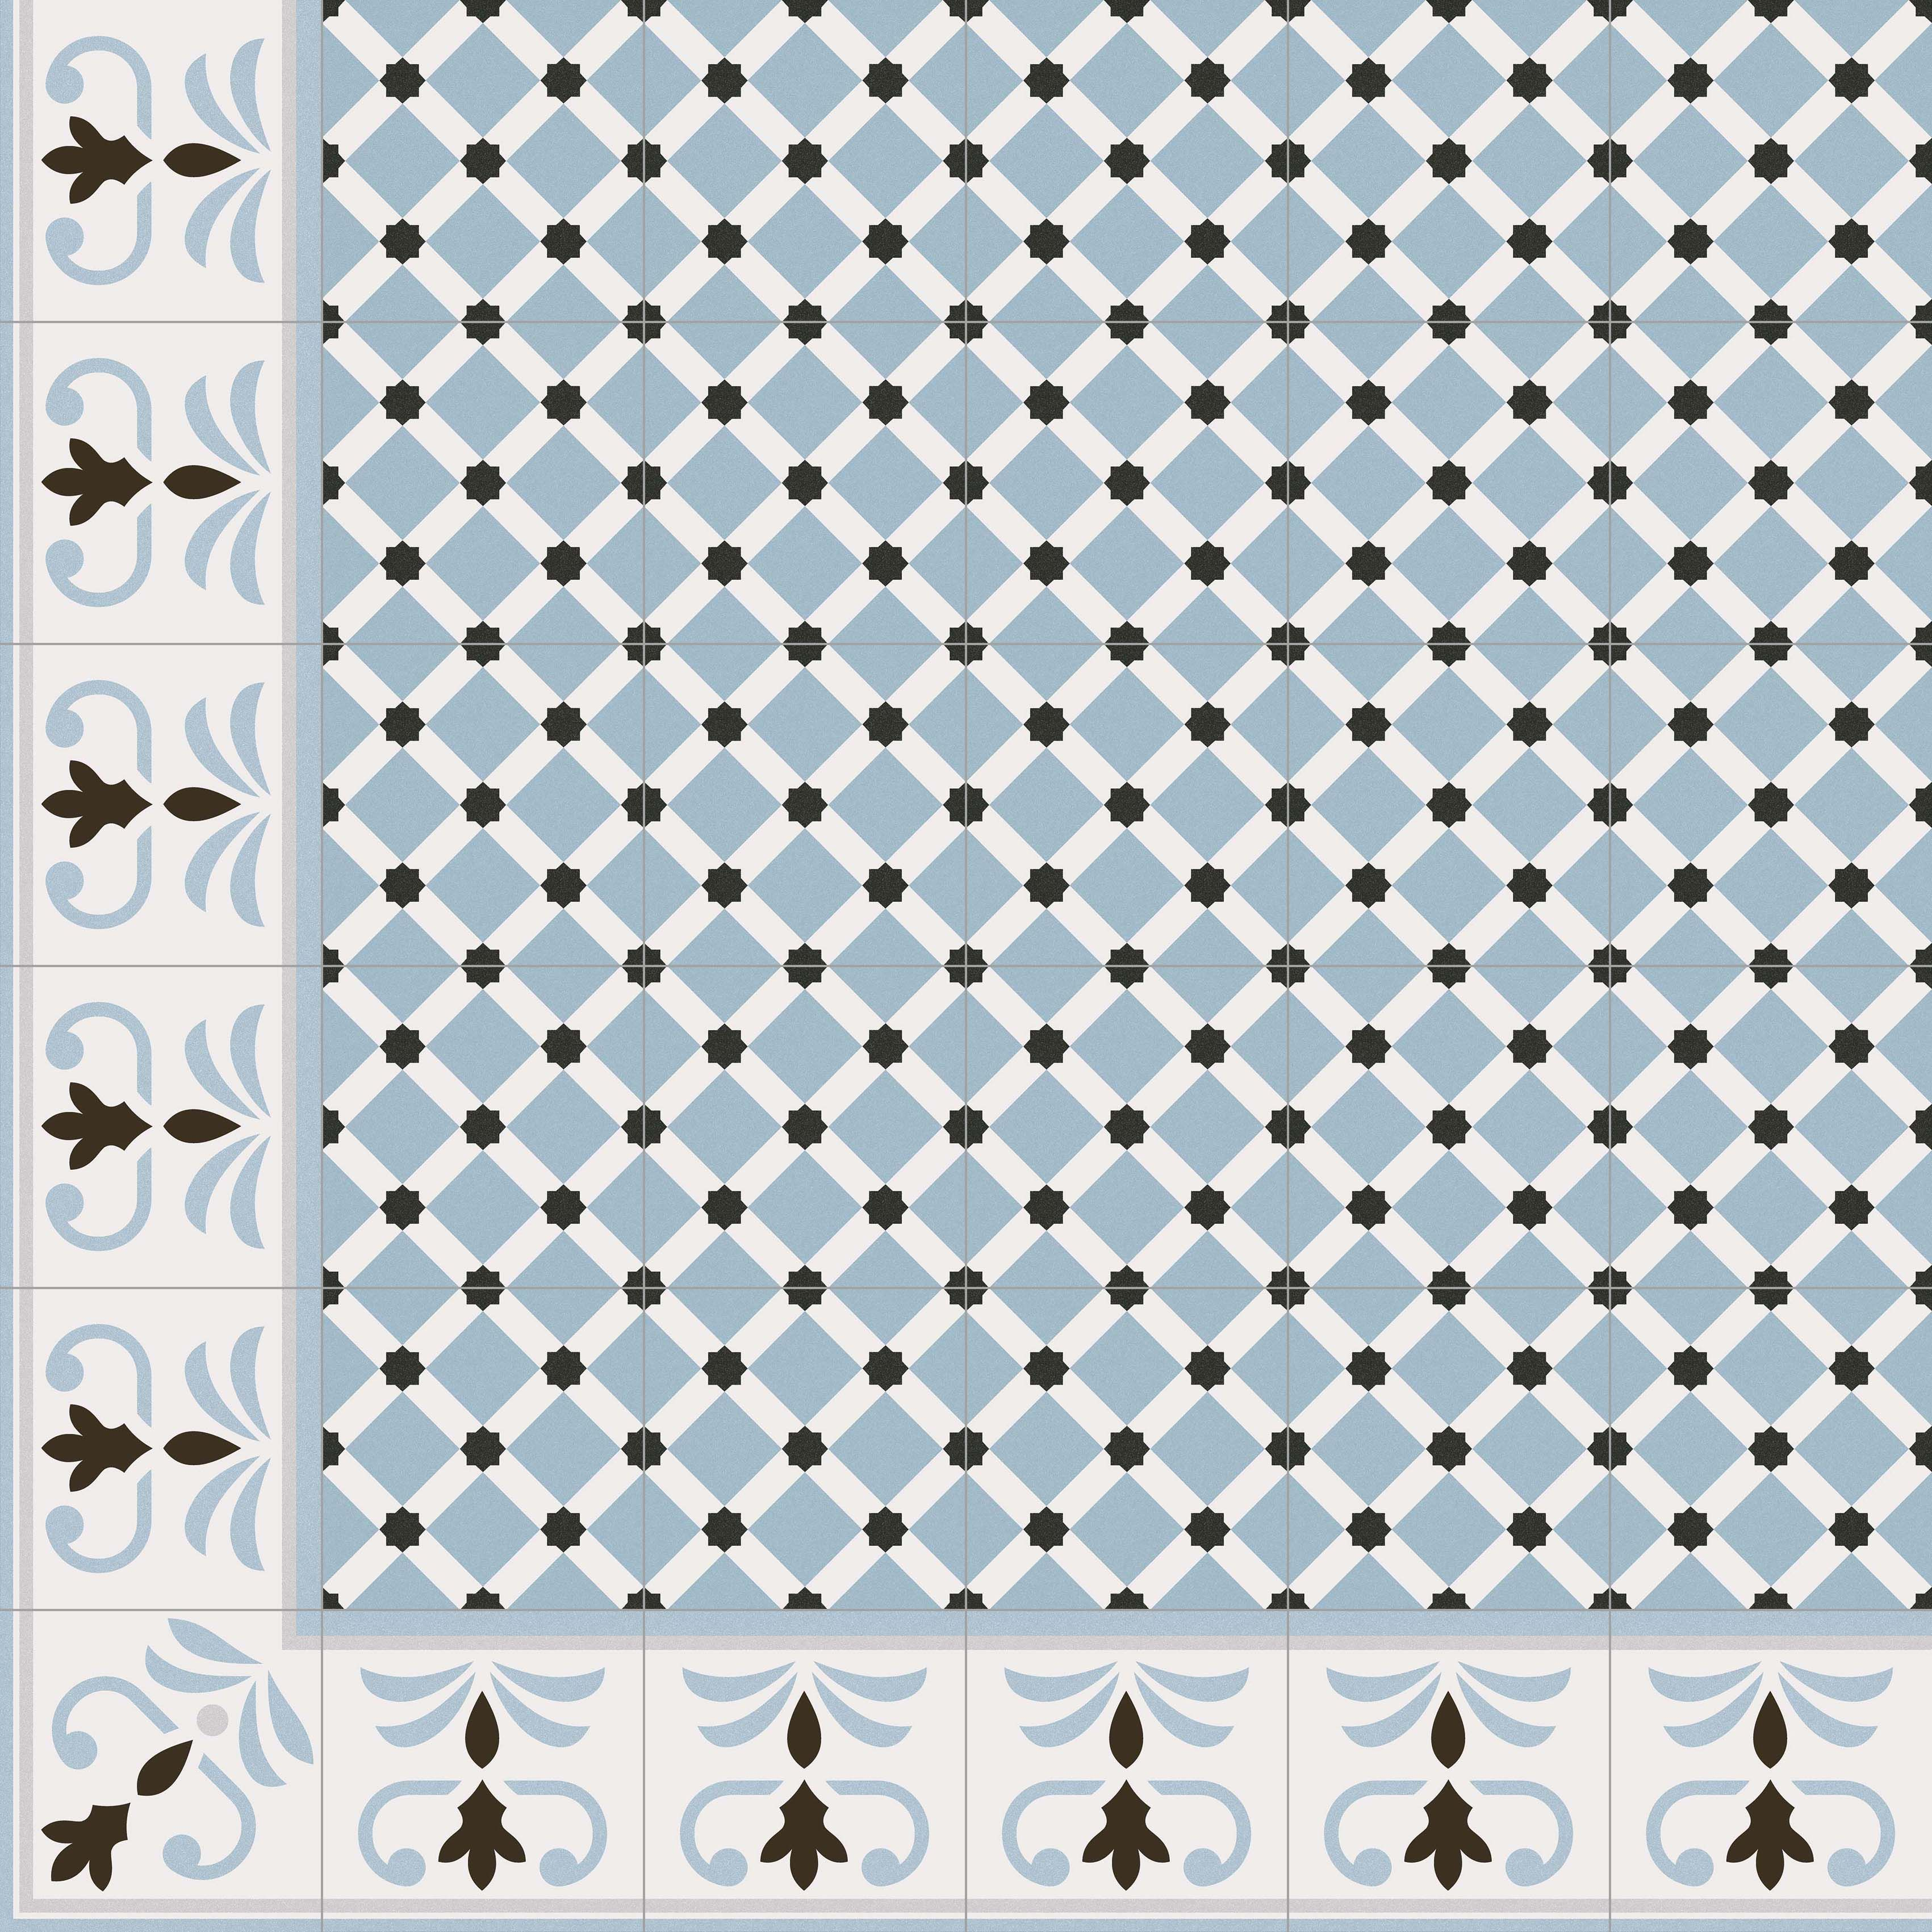 Floor Tiles Gres Encaustic Cement Tiles Effect Tiles 1900 20x20